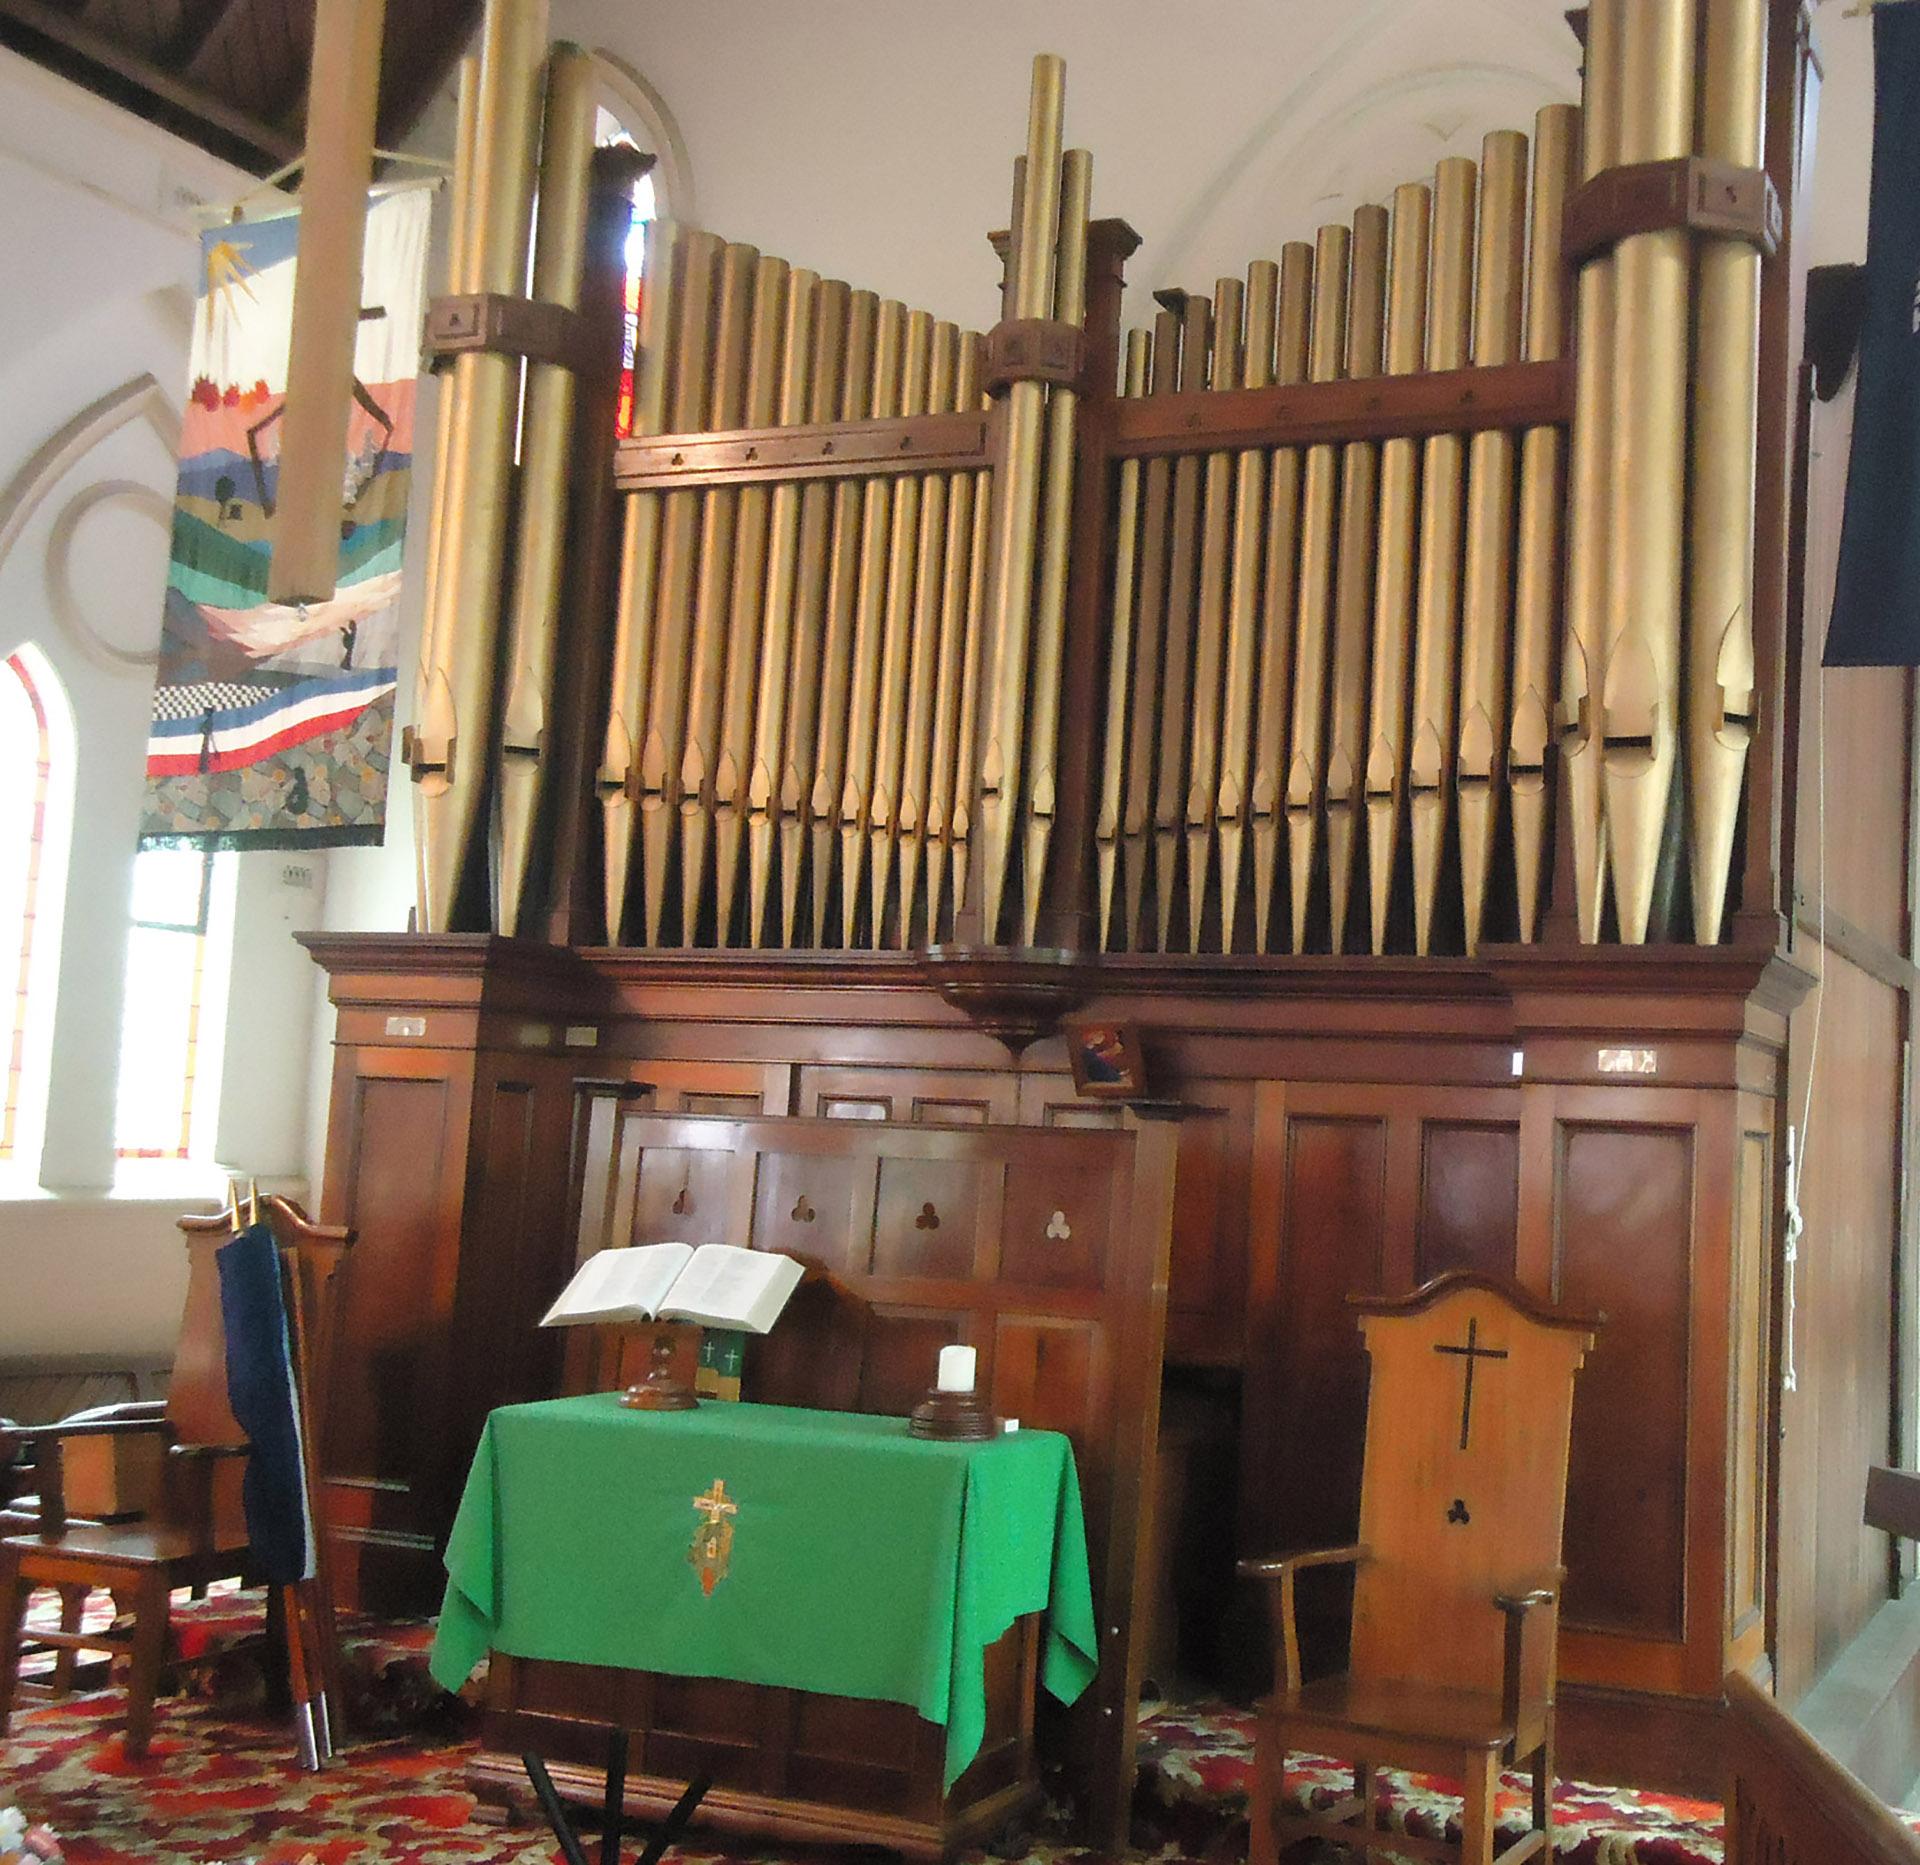 Armidale Methodist Church First World War Memorial Organ